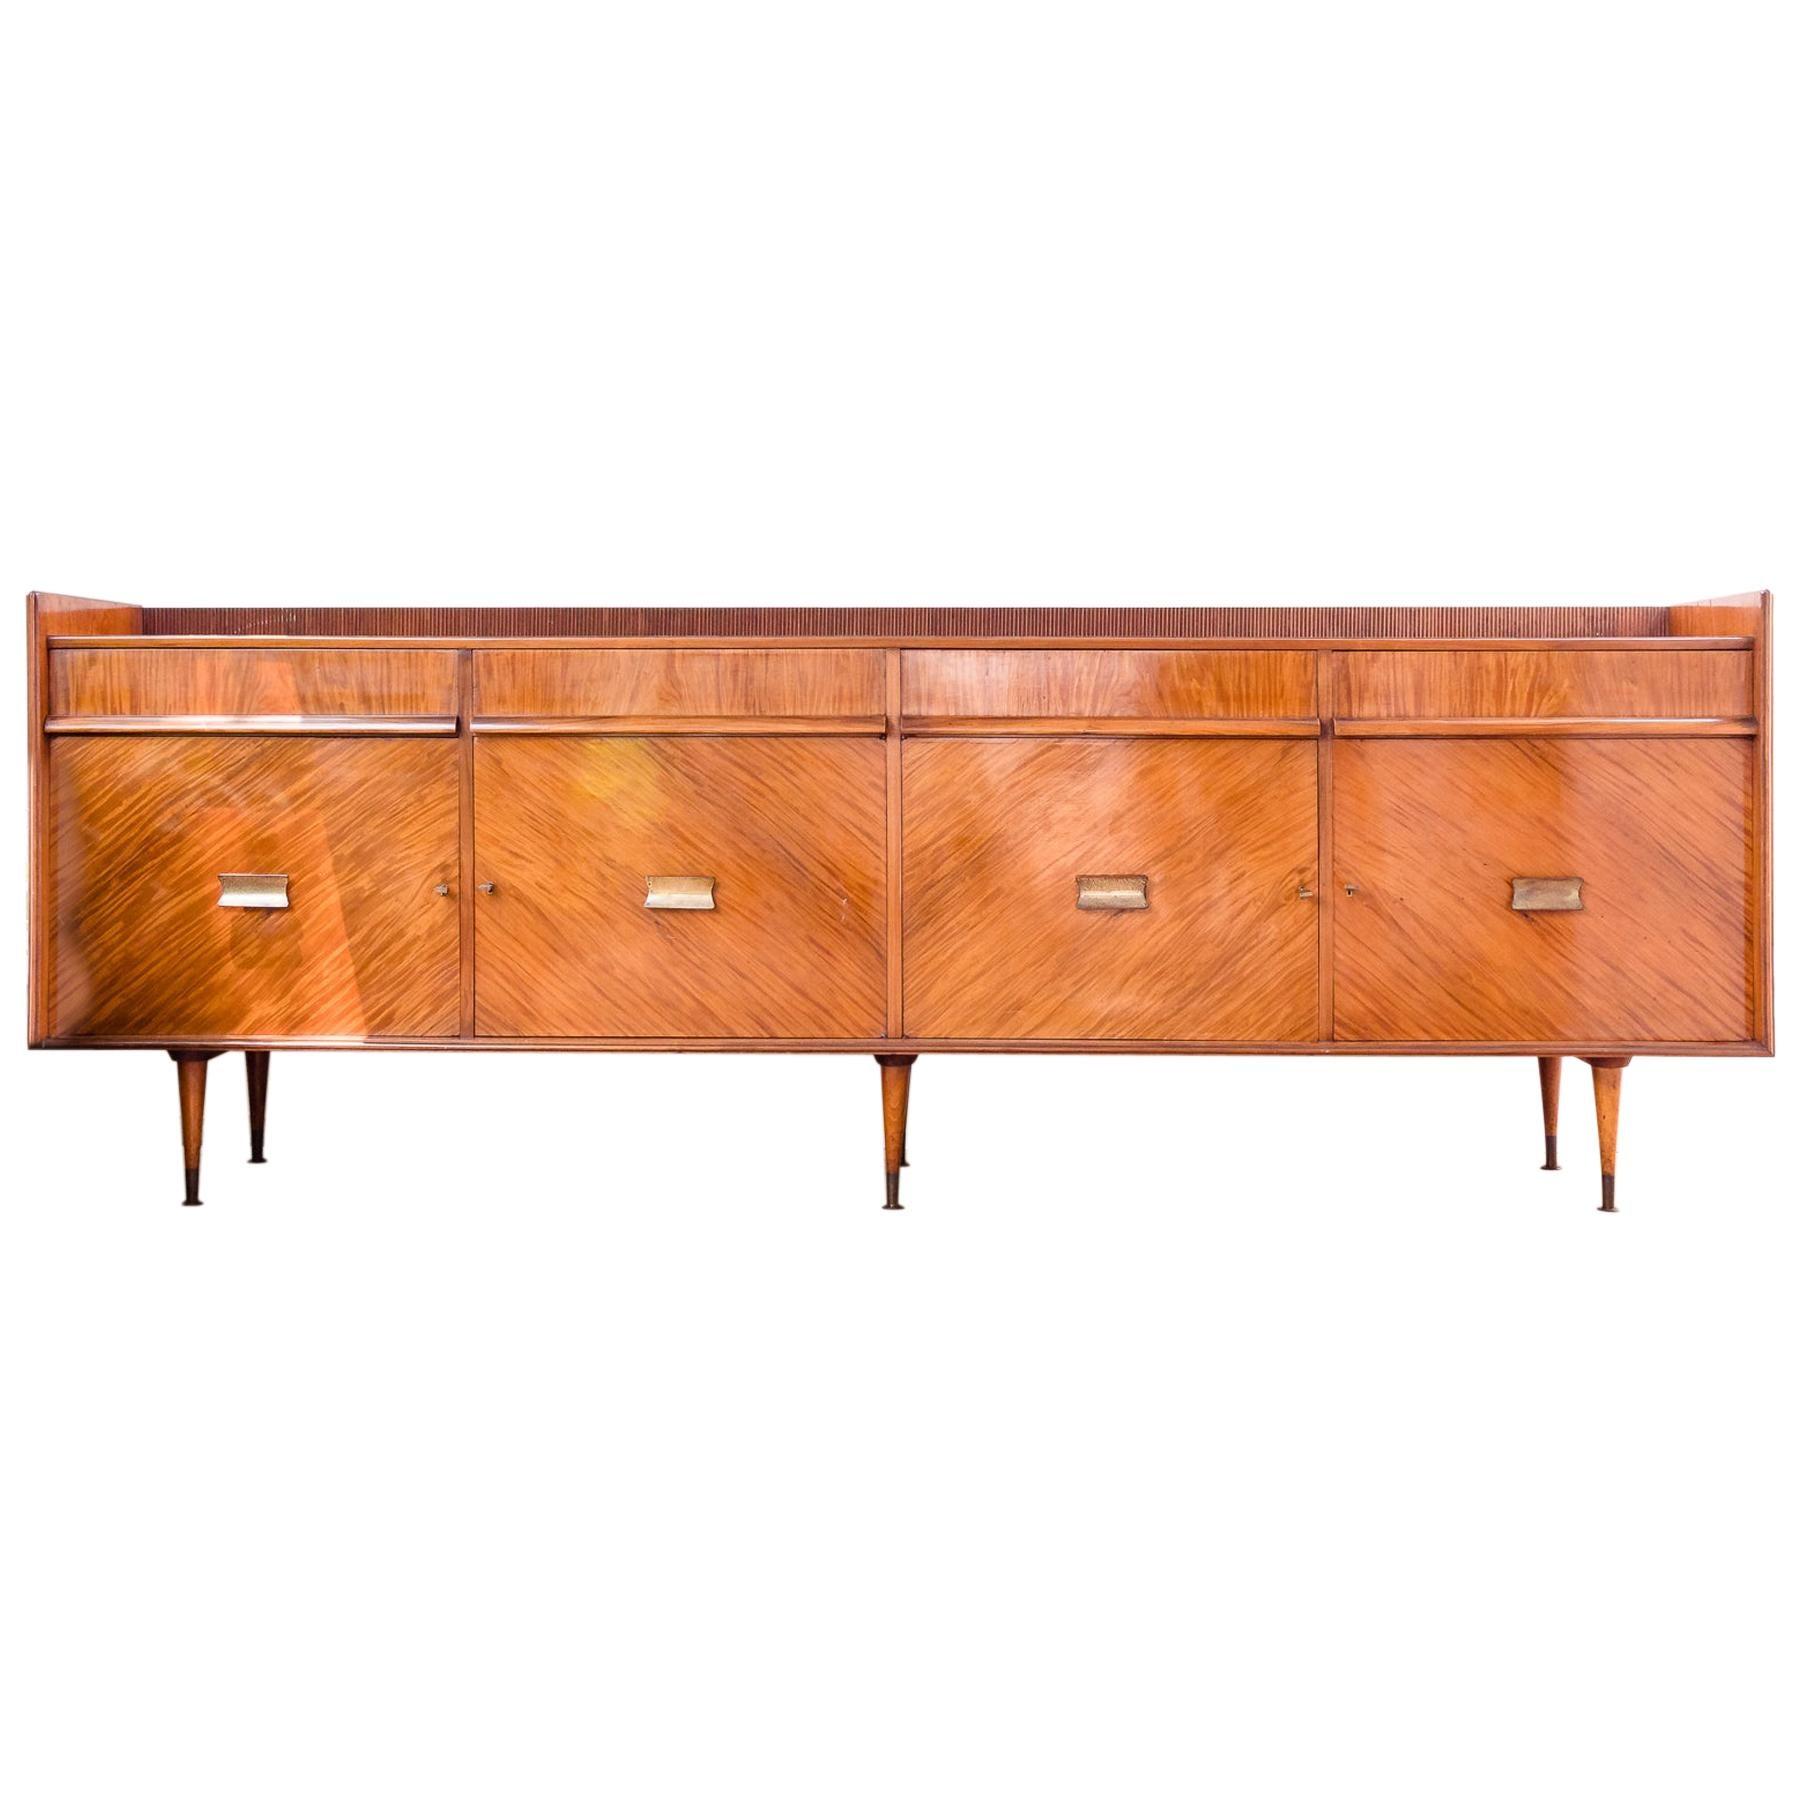 Brazilian Modern Sideboard in Hardwood, Designed by Giuseppe Scapinelli